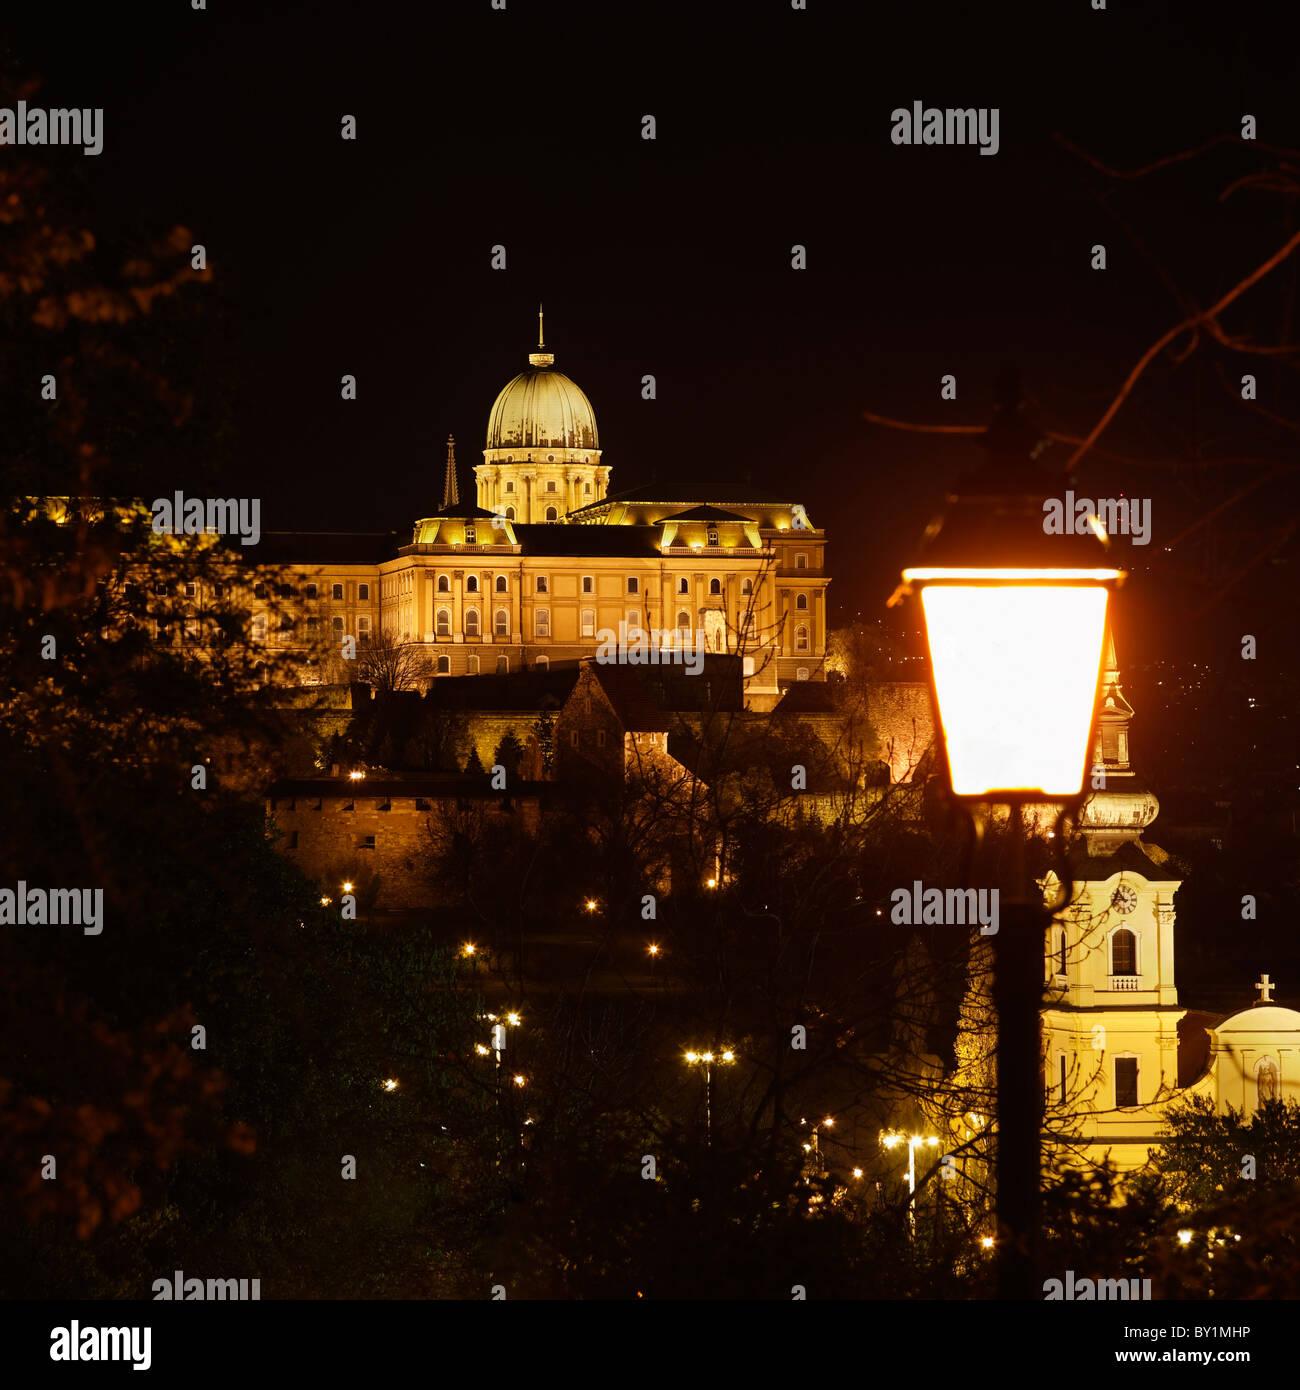 Buda Castle - Stock Image